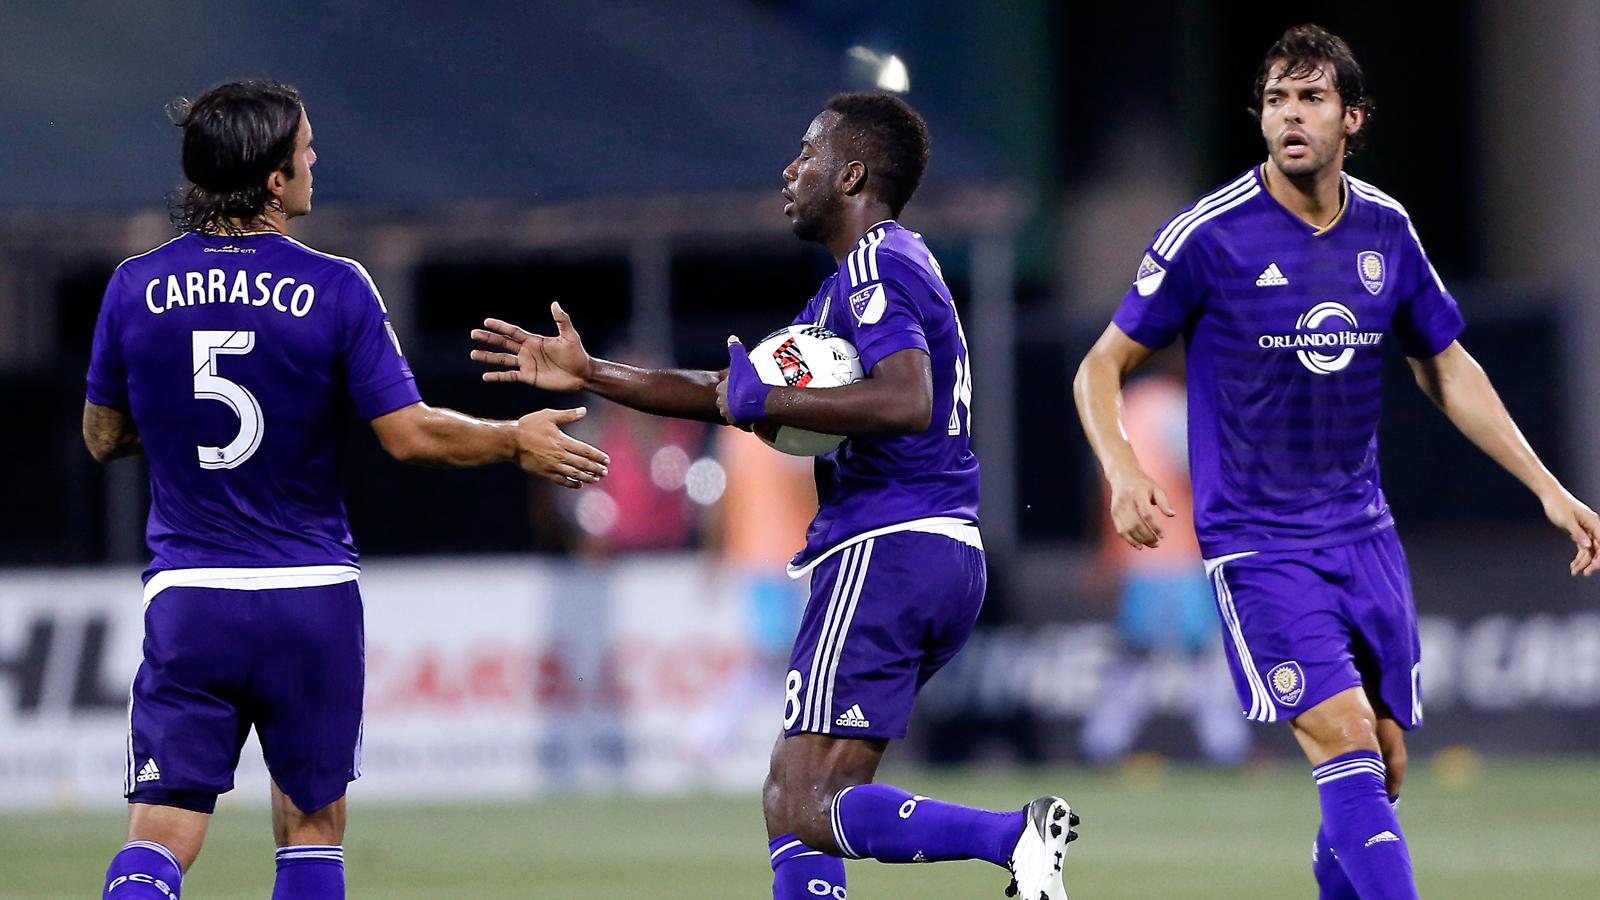 Orlando City notches 2 second-half goals to tie Columbus Crew